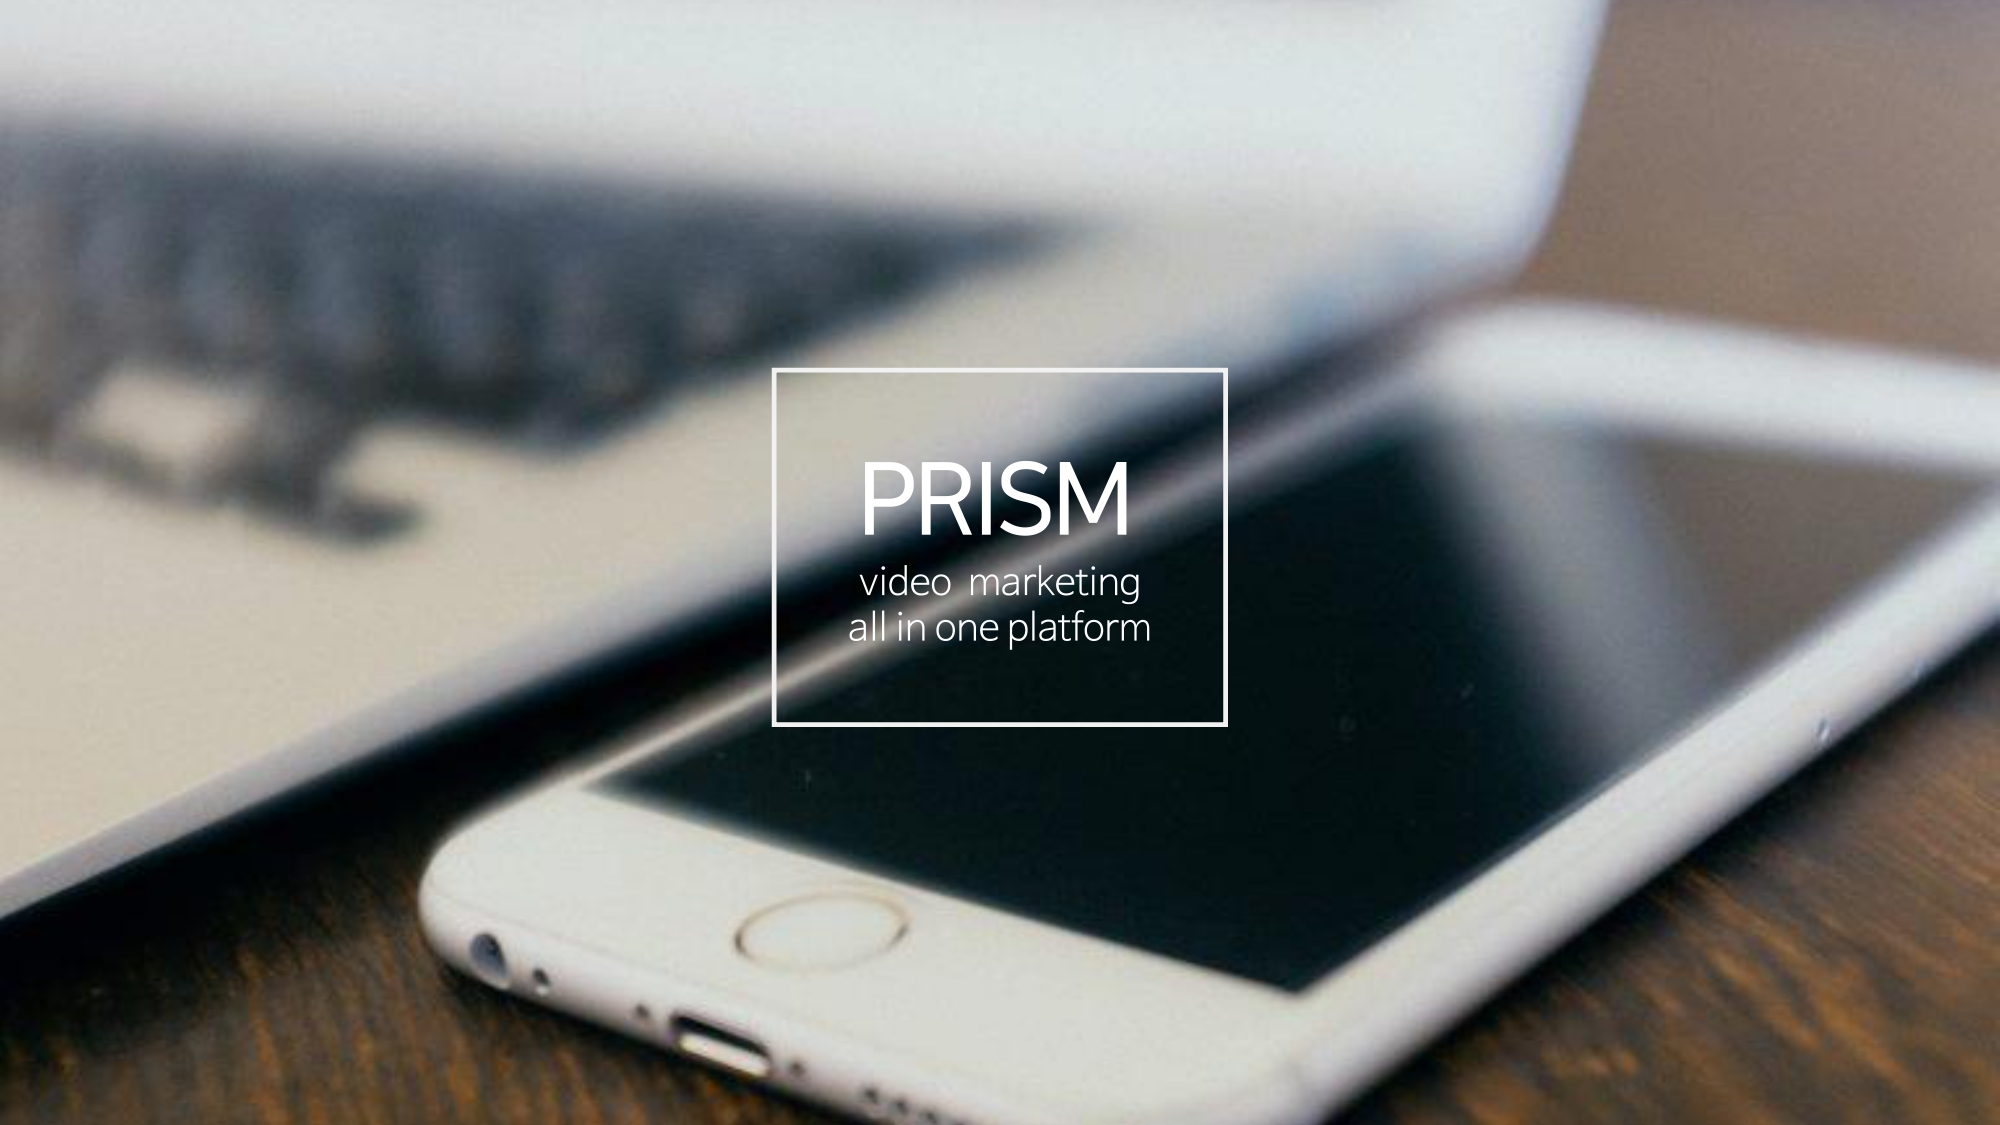 2019_Prism_통합제안서_pages-to-jpg-0022.jpg